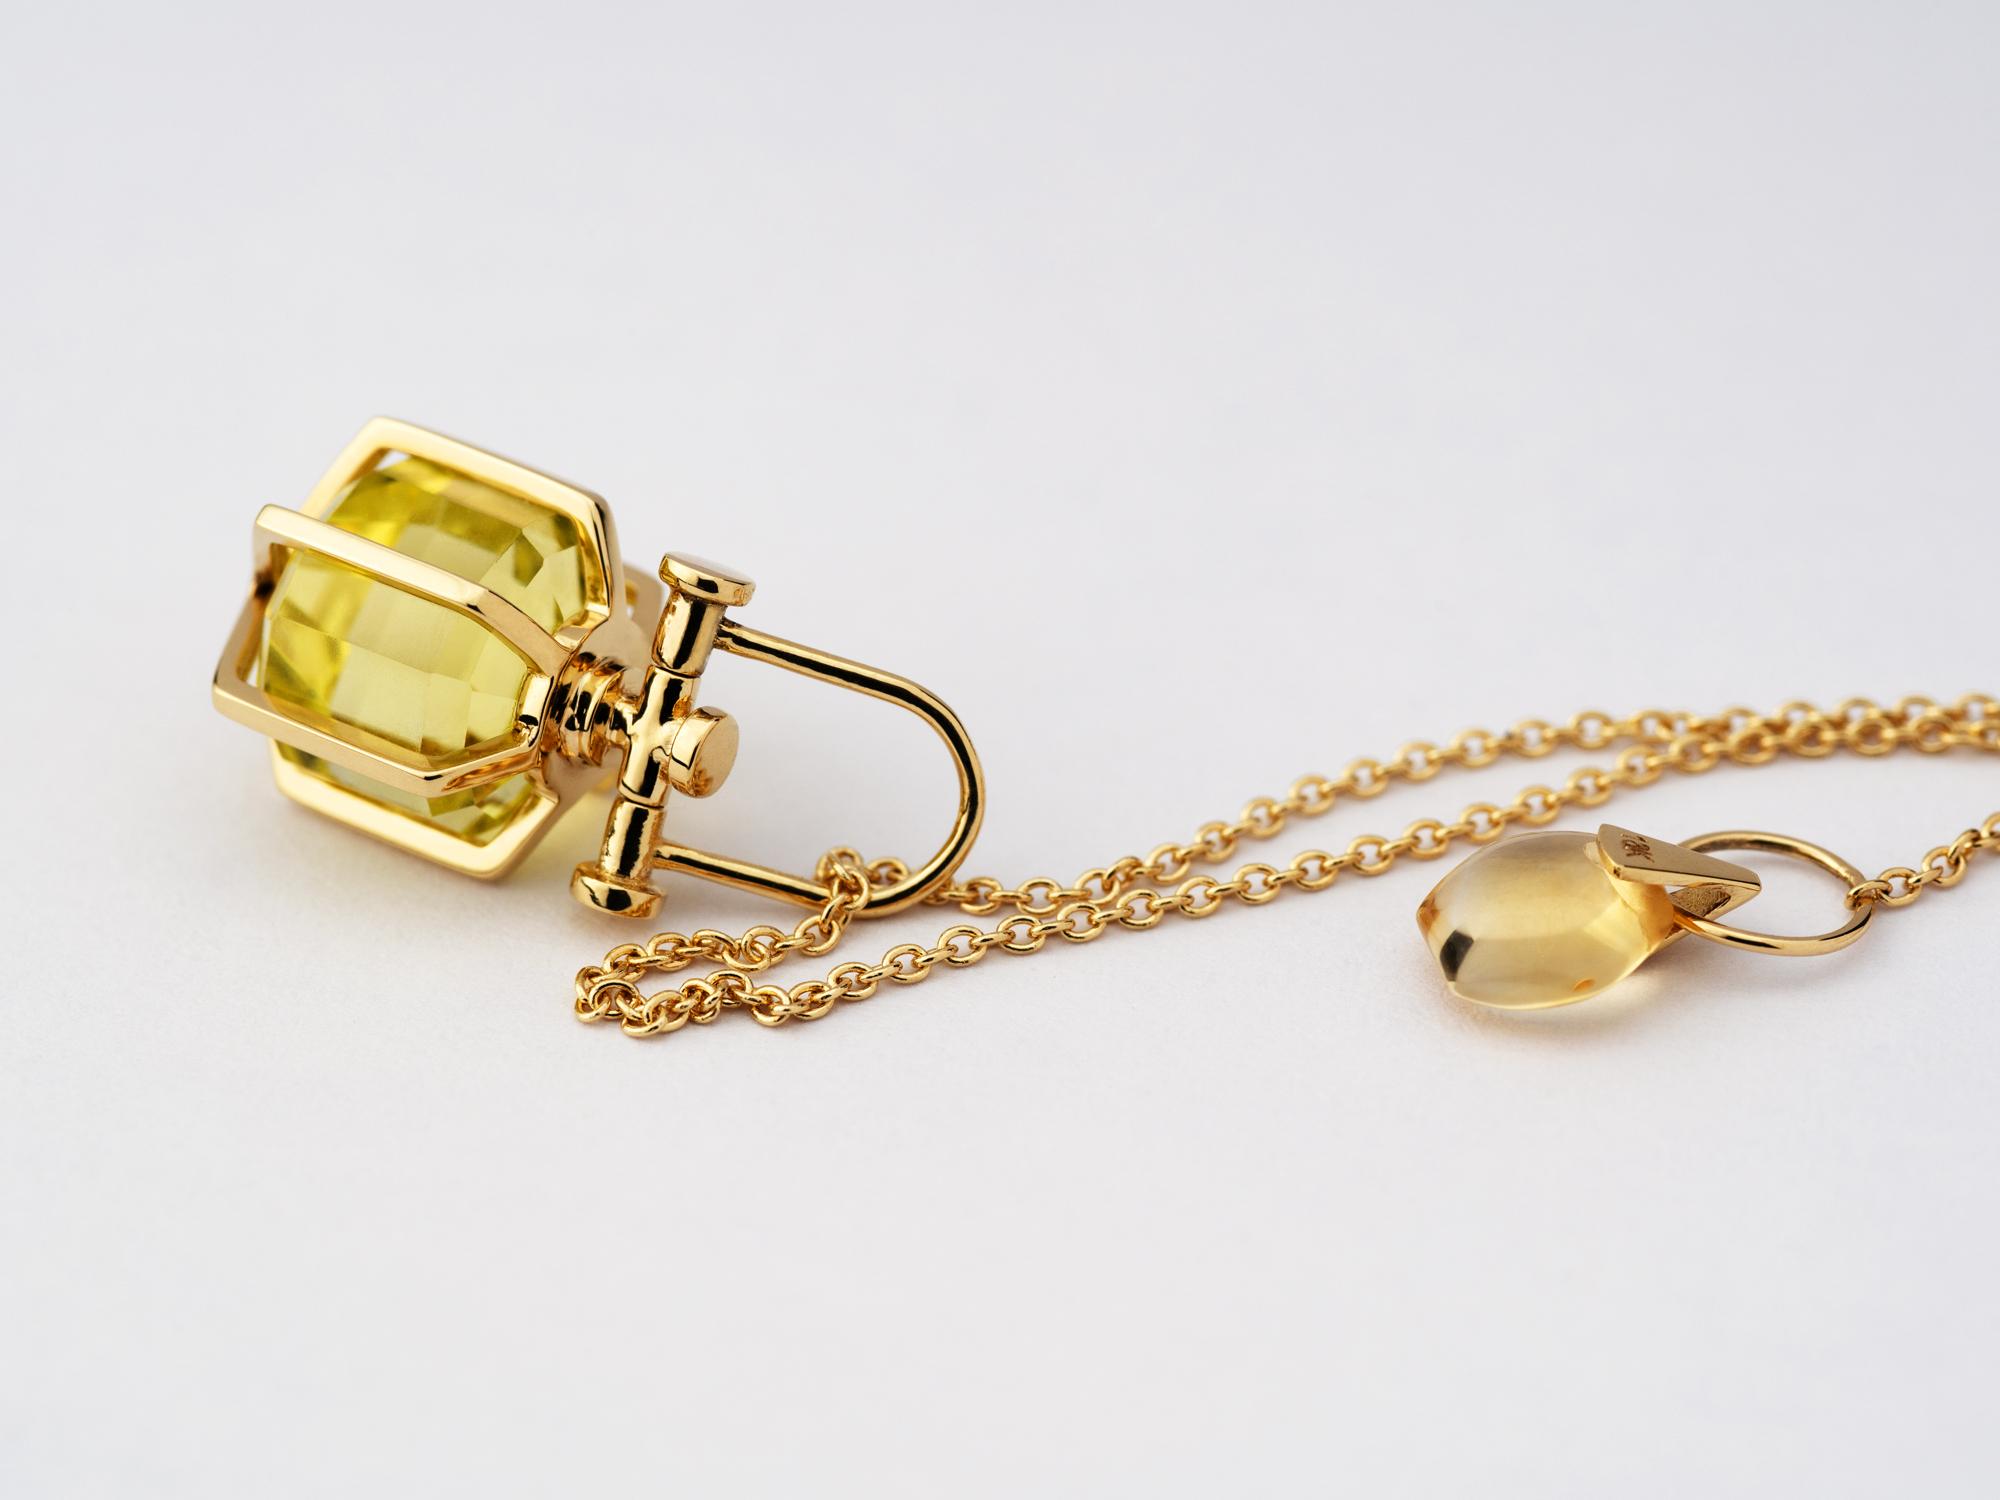 Mini Rebecca Li Six Senses Talisman Pendant Necklace, 18k Solild Yellow Gold, Lemon Citrine, 12 Sided Crystal Point